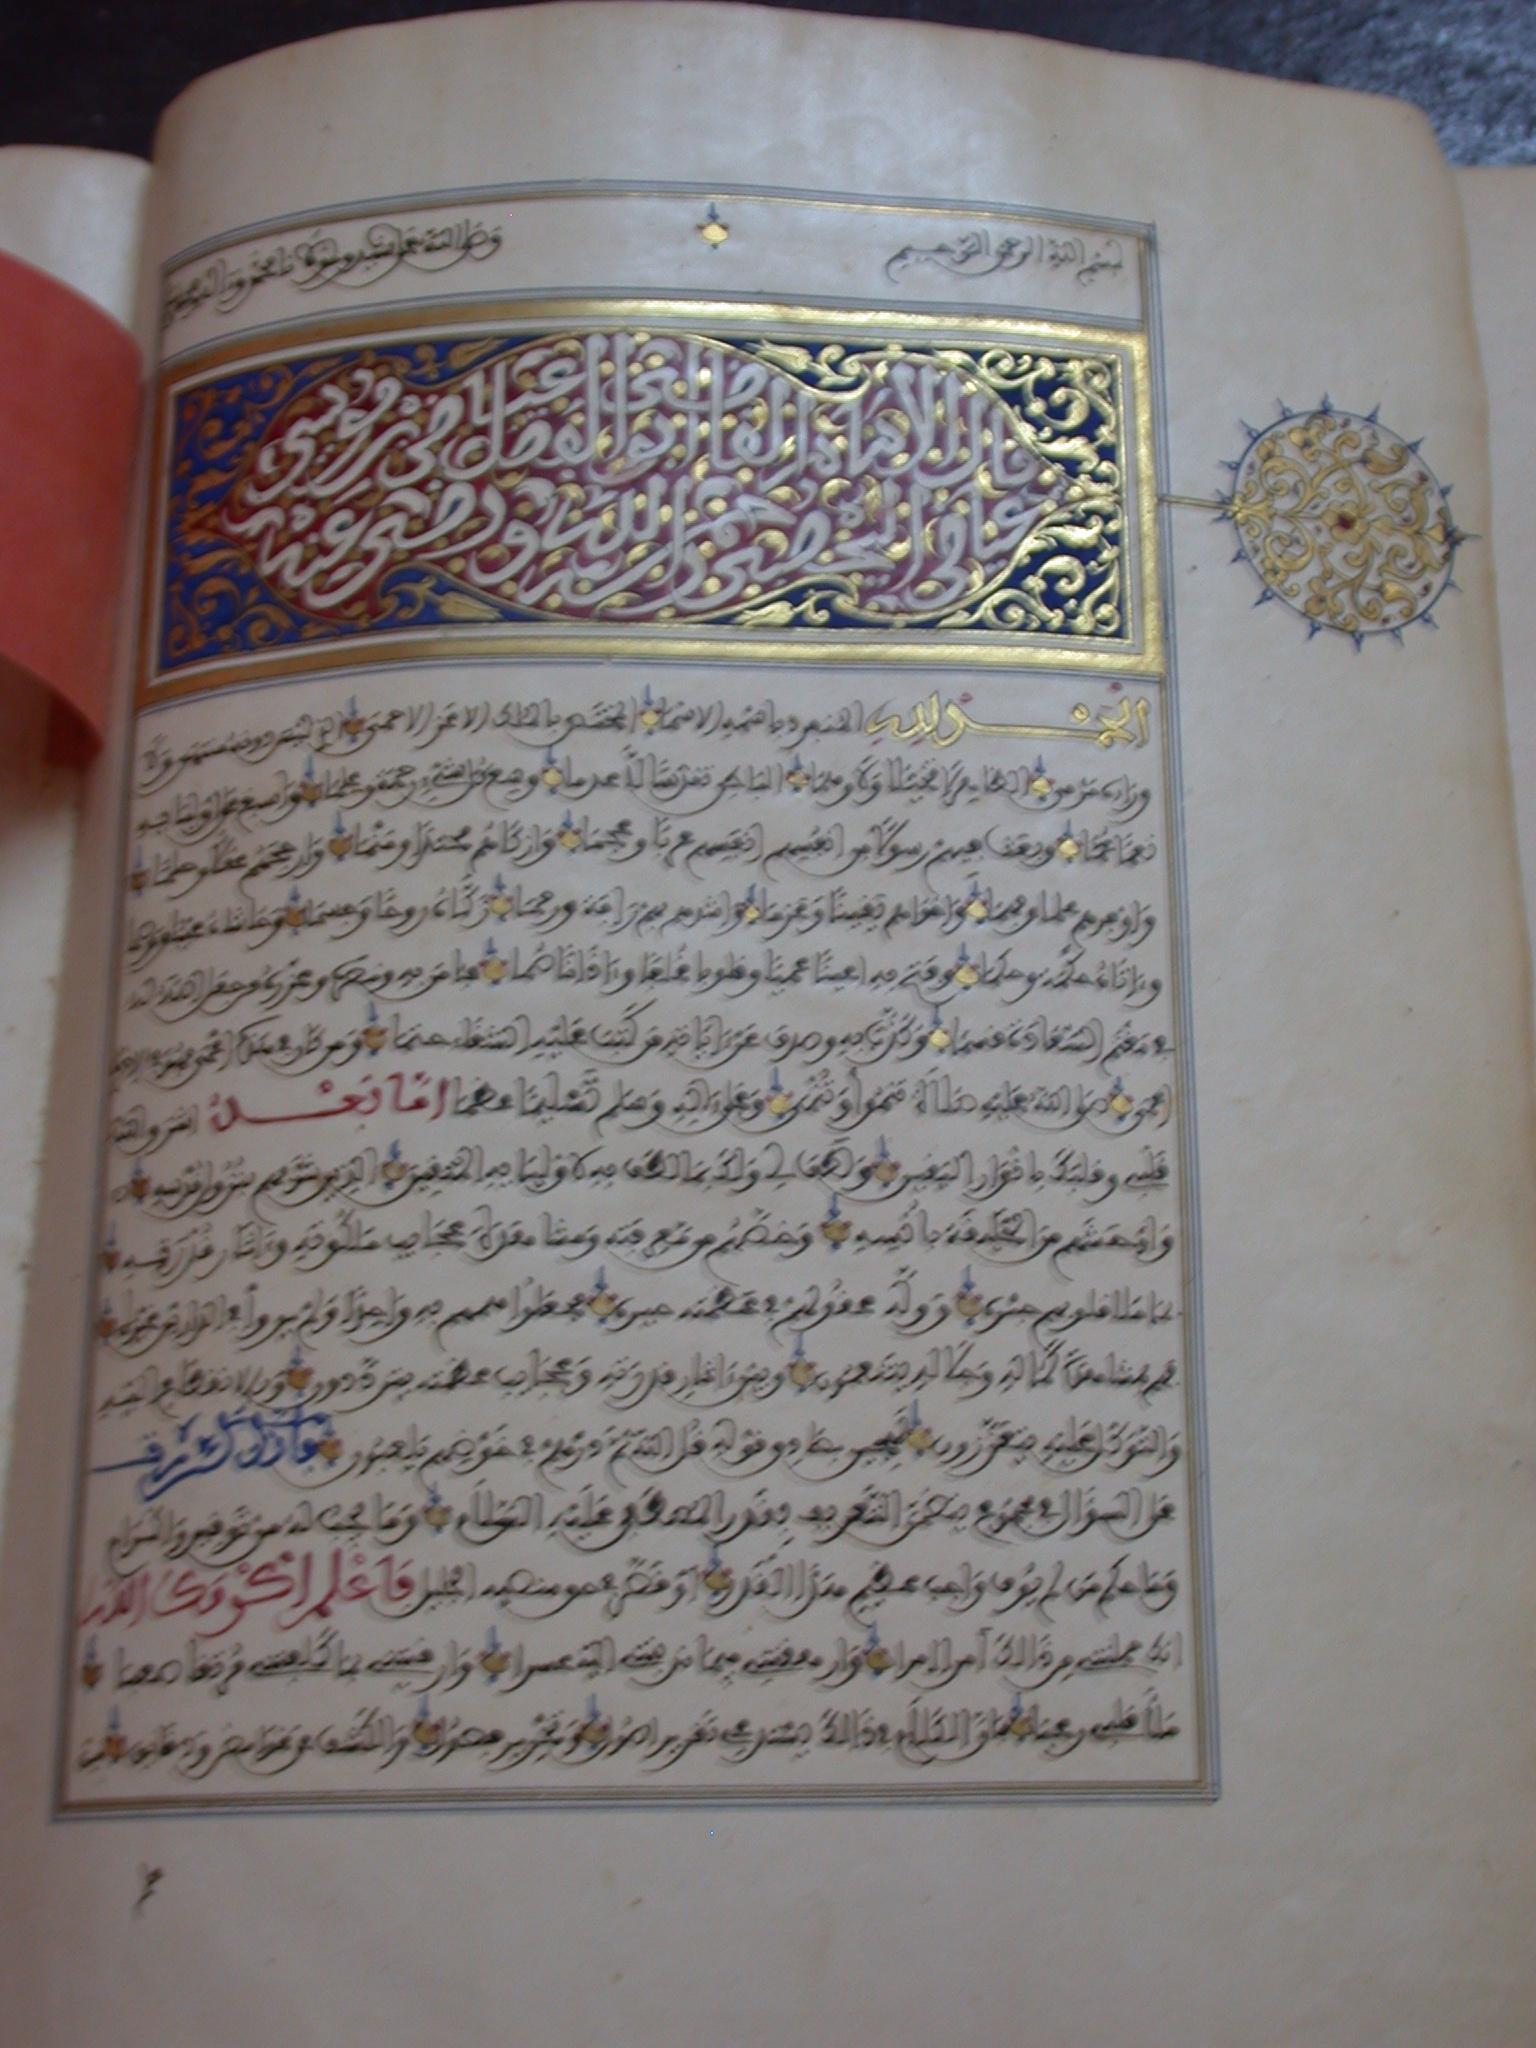 Al Shifa Qadi Alyad, Illuminated Manuscript, Manuscript Library, Timbuktu, Mali